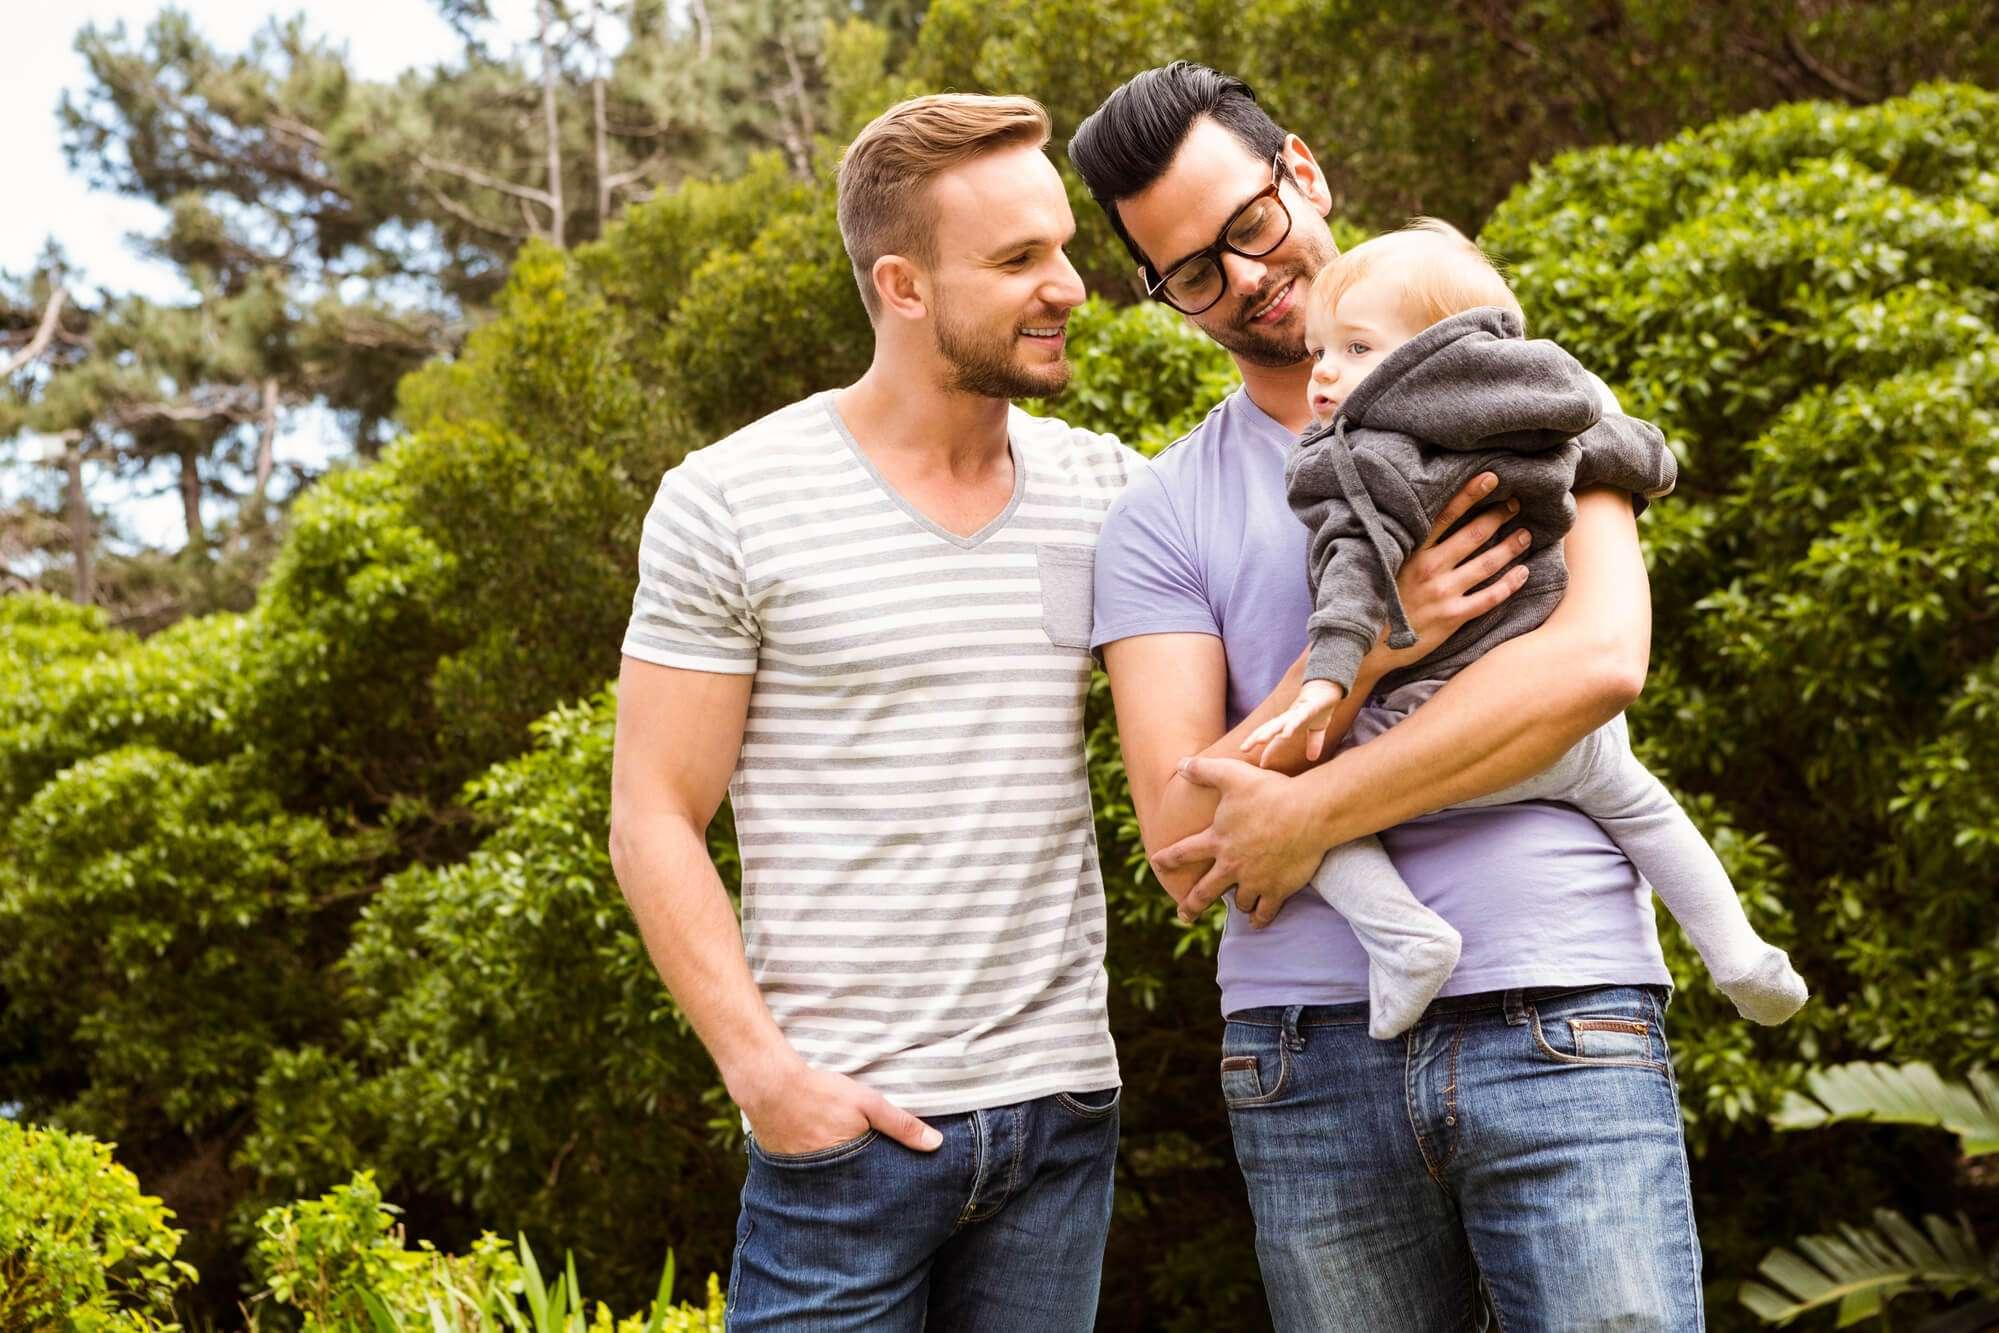 Gravidez homoafetiva masculina: veja as opções